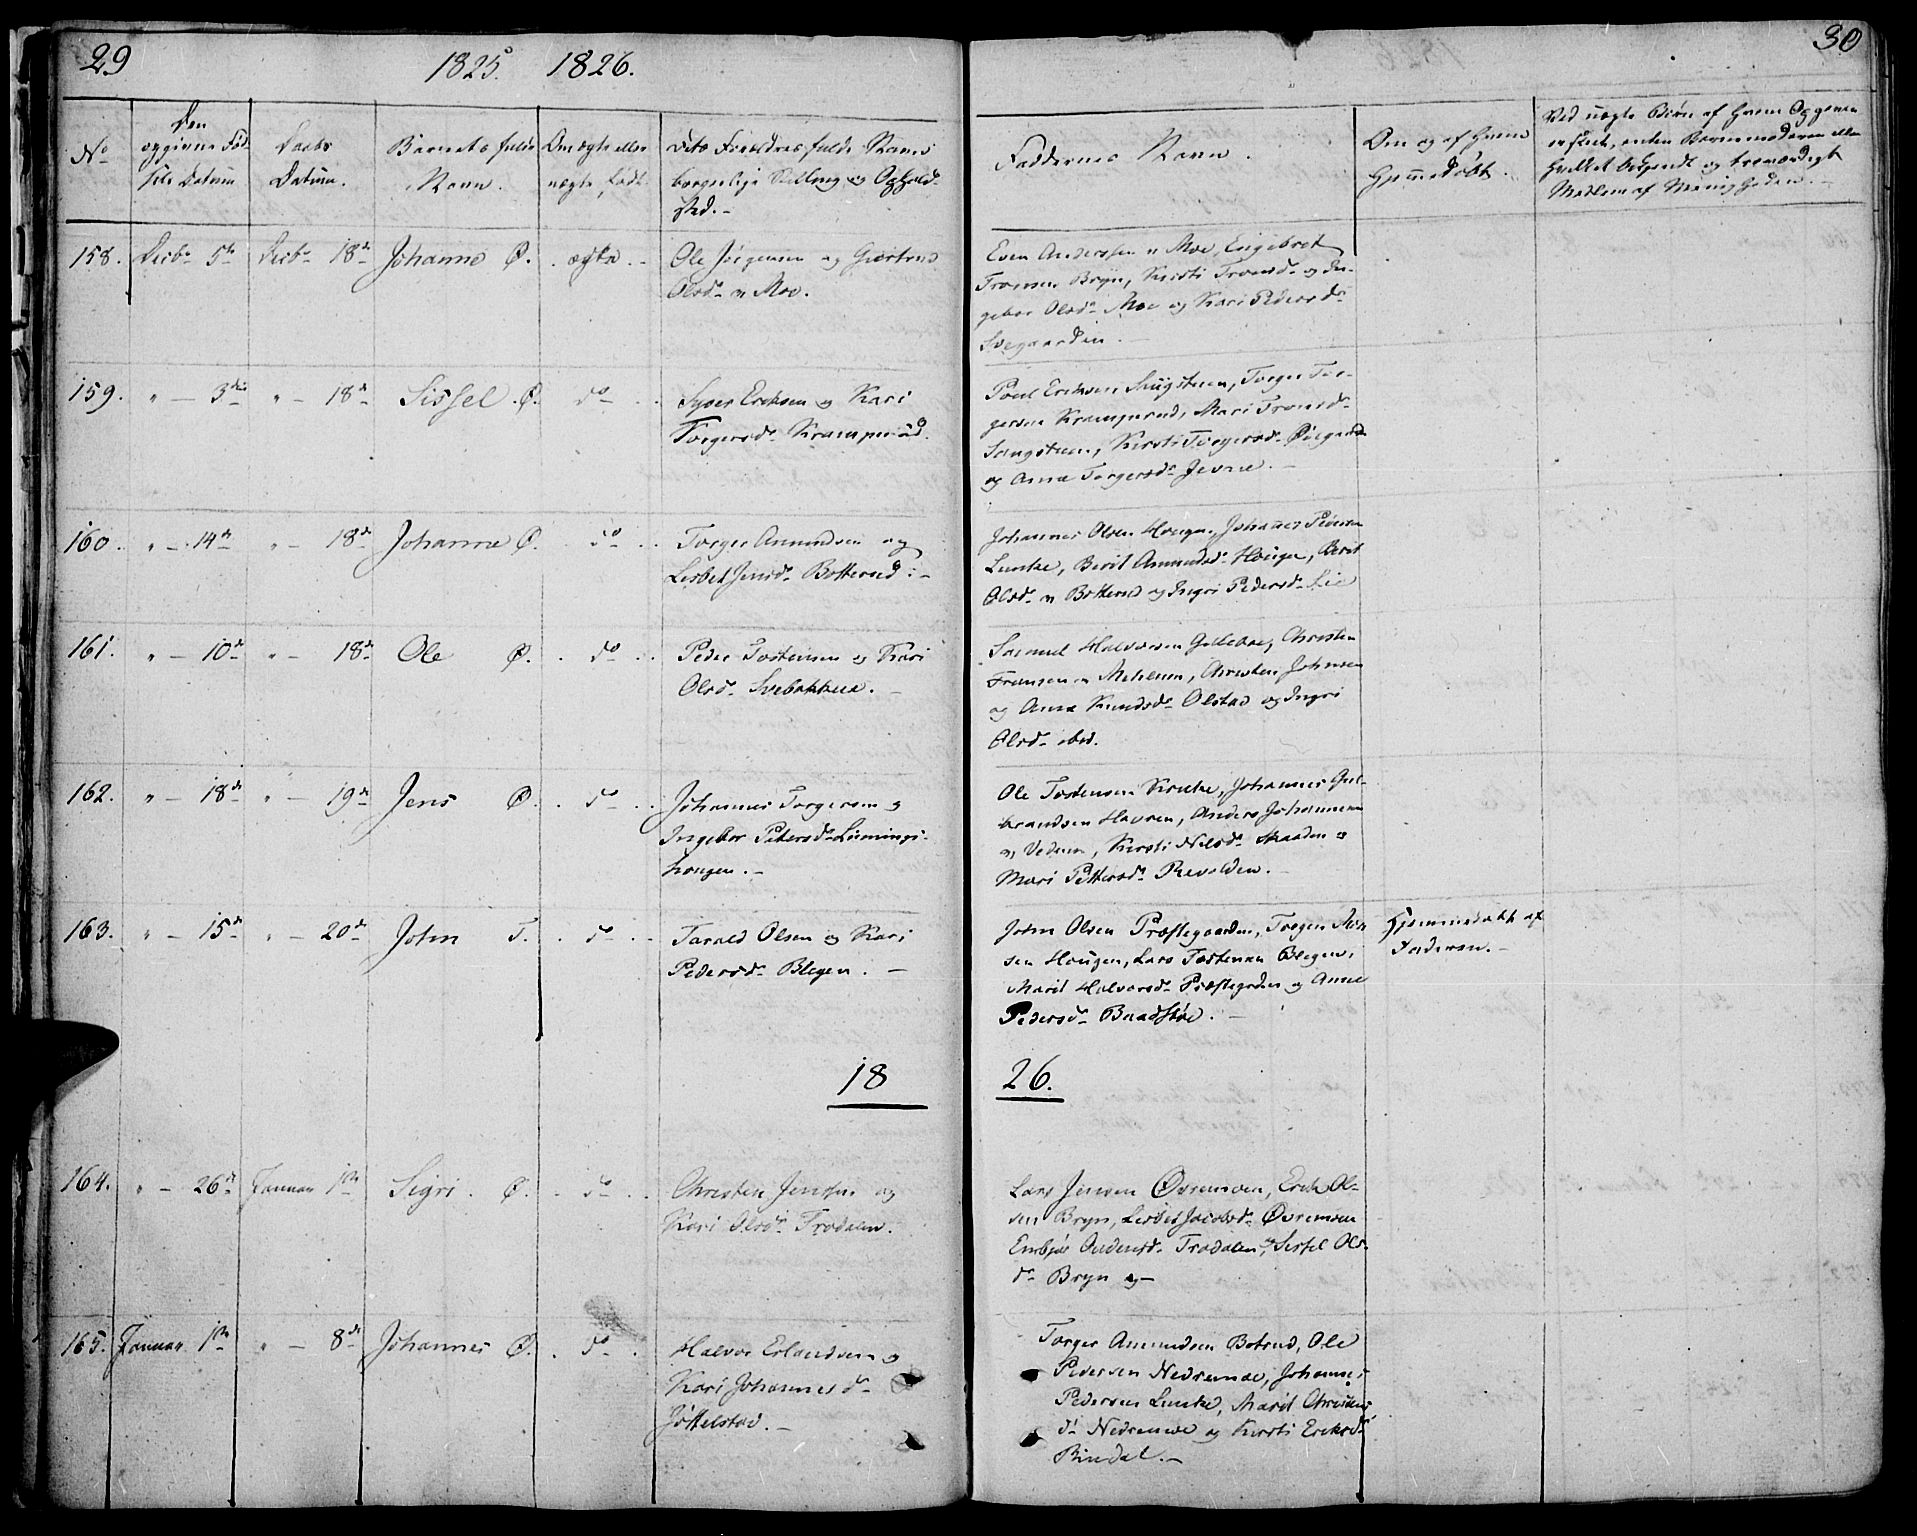 SAH, Øyer prestekontor, Ministerialbok nr. 4, 1824-1841, s. 29-30